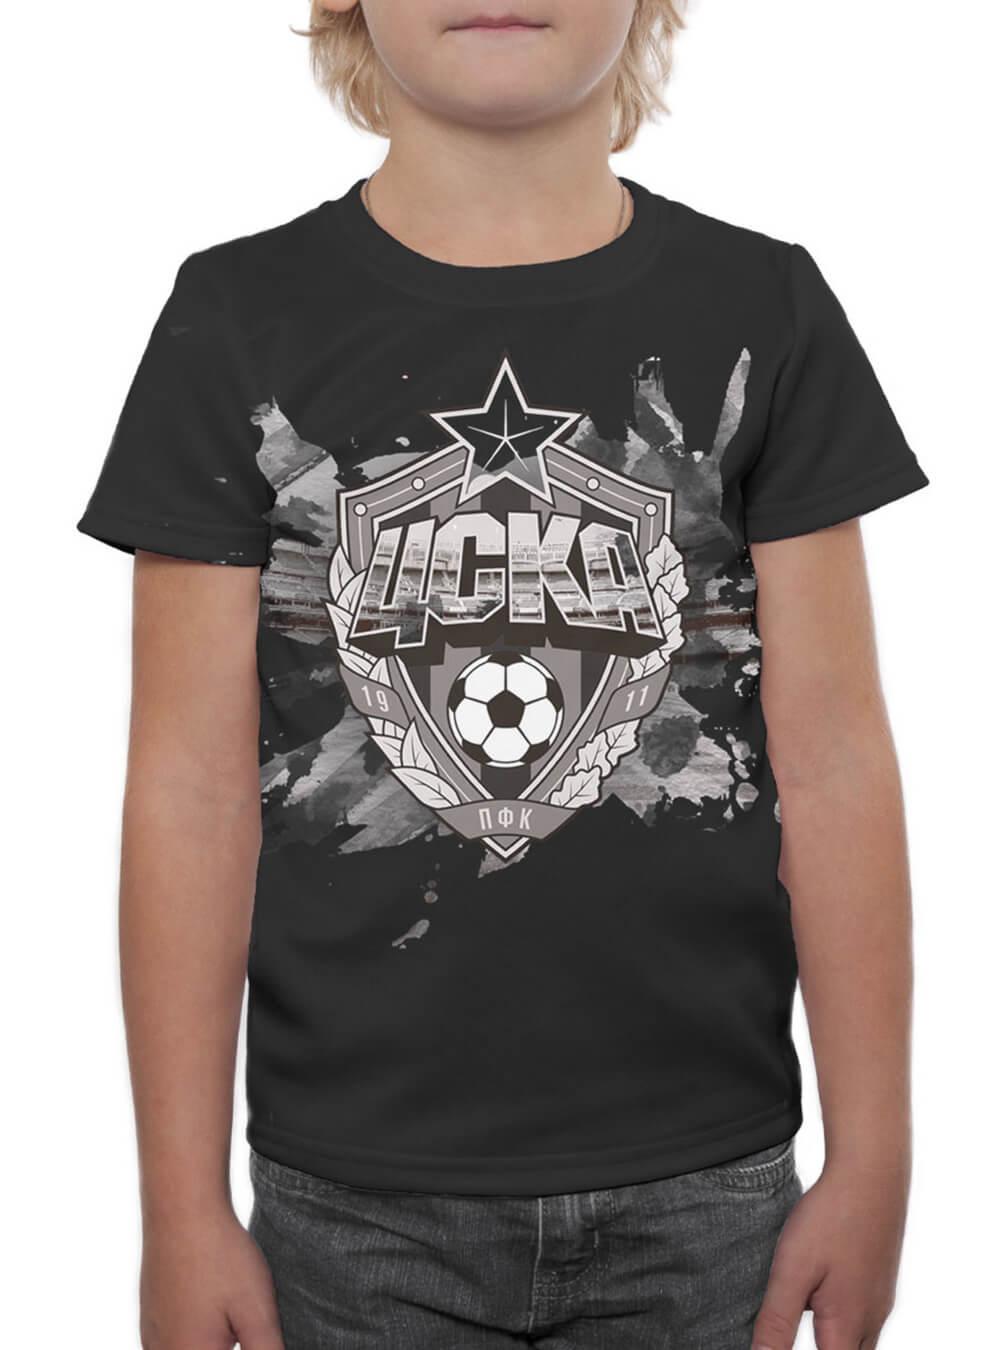 Футболка детская Эмблема черная (134)Одежда на заказ<br>Футболка детская Эмблема черная<br>